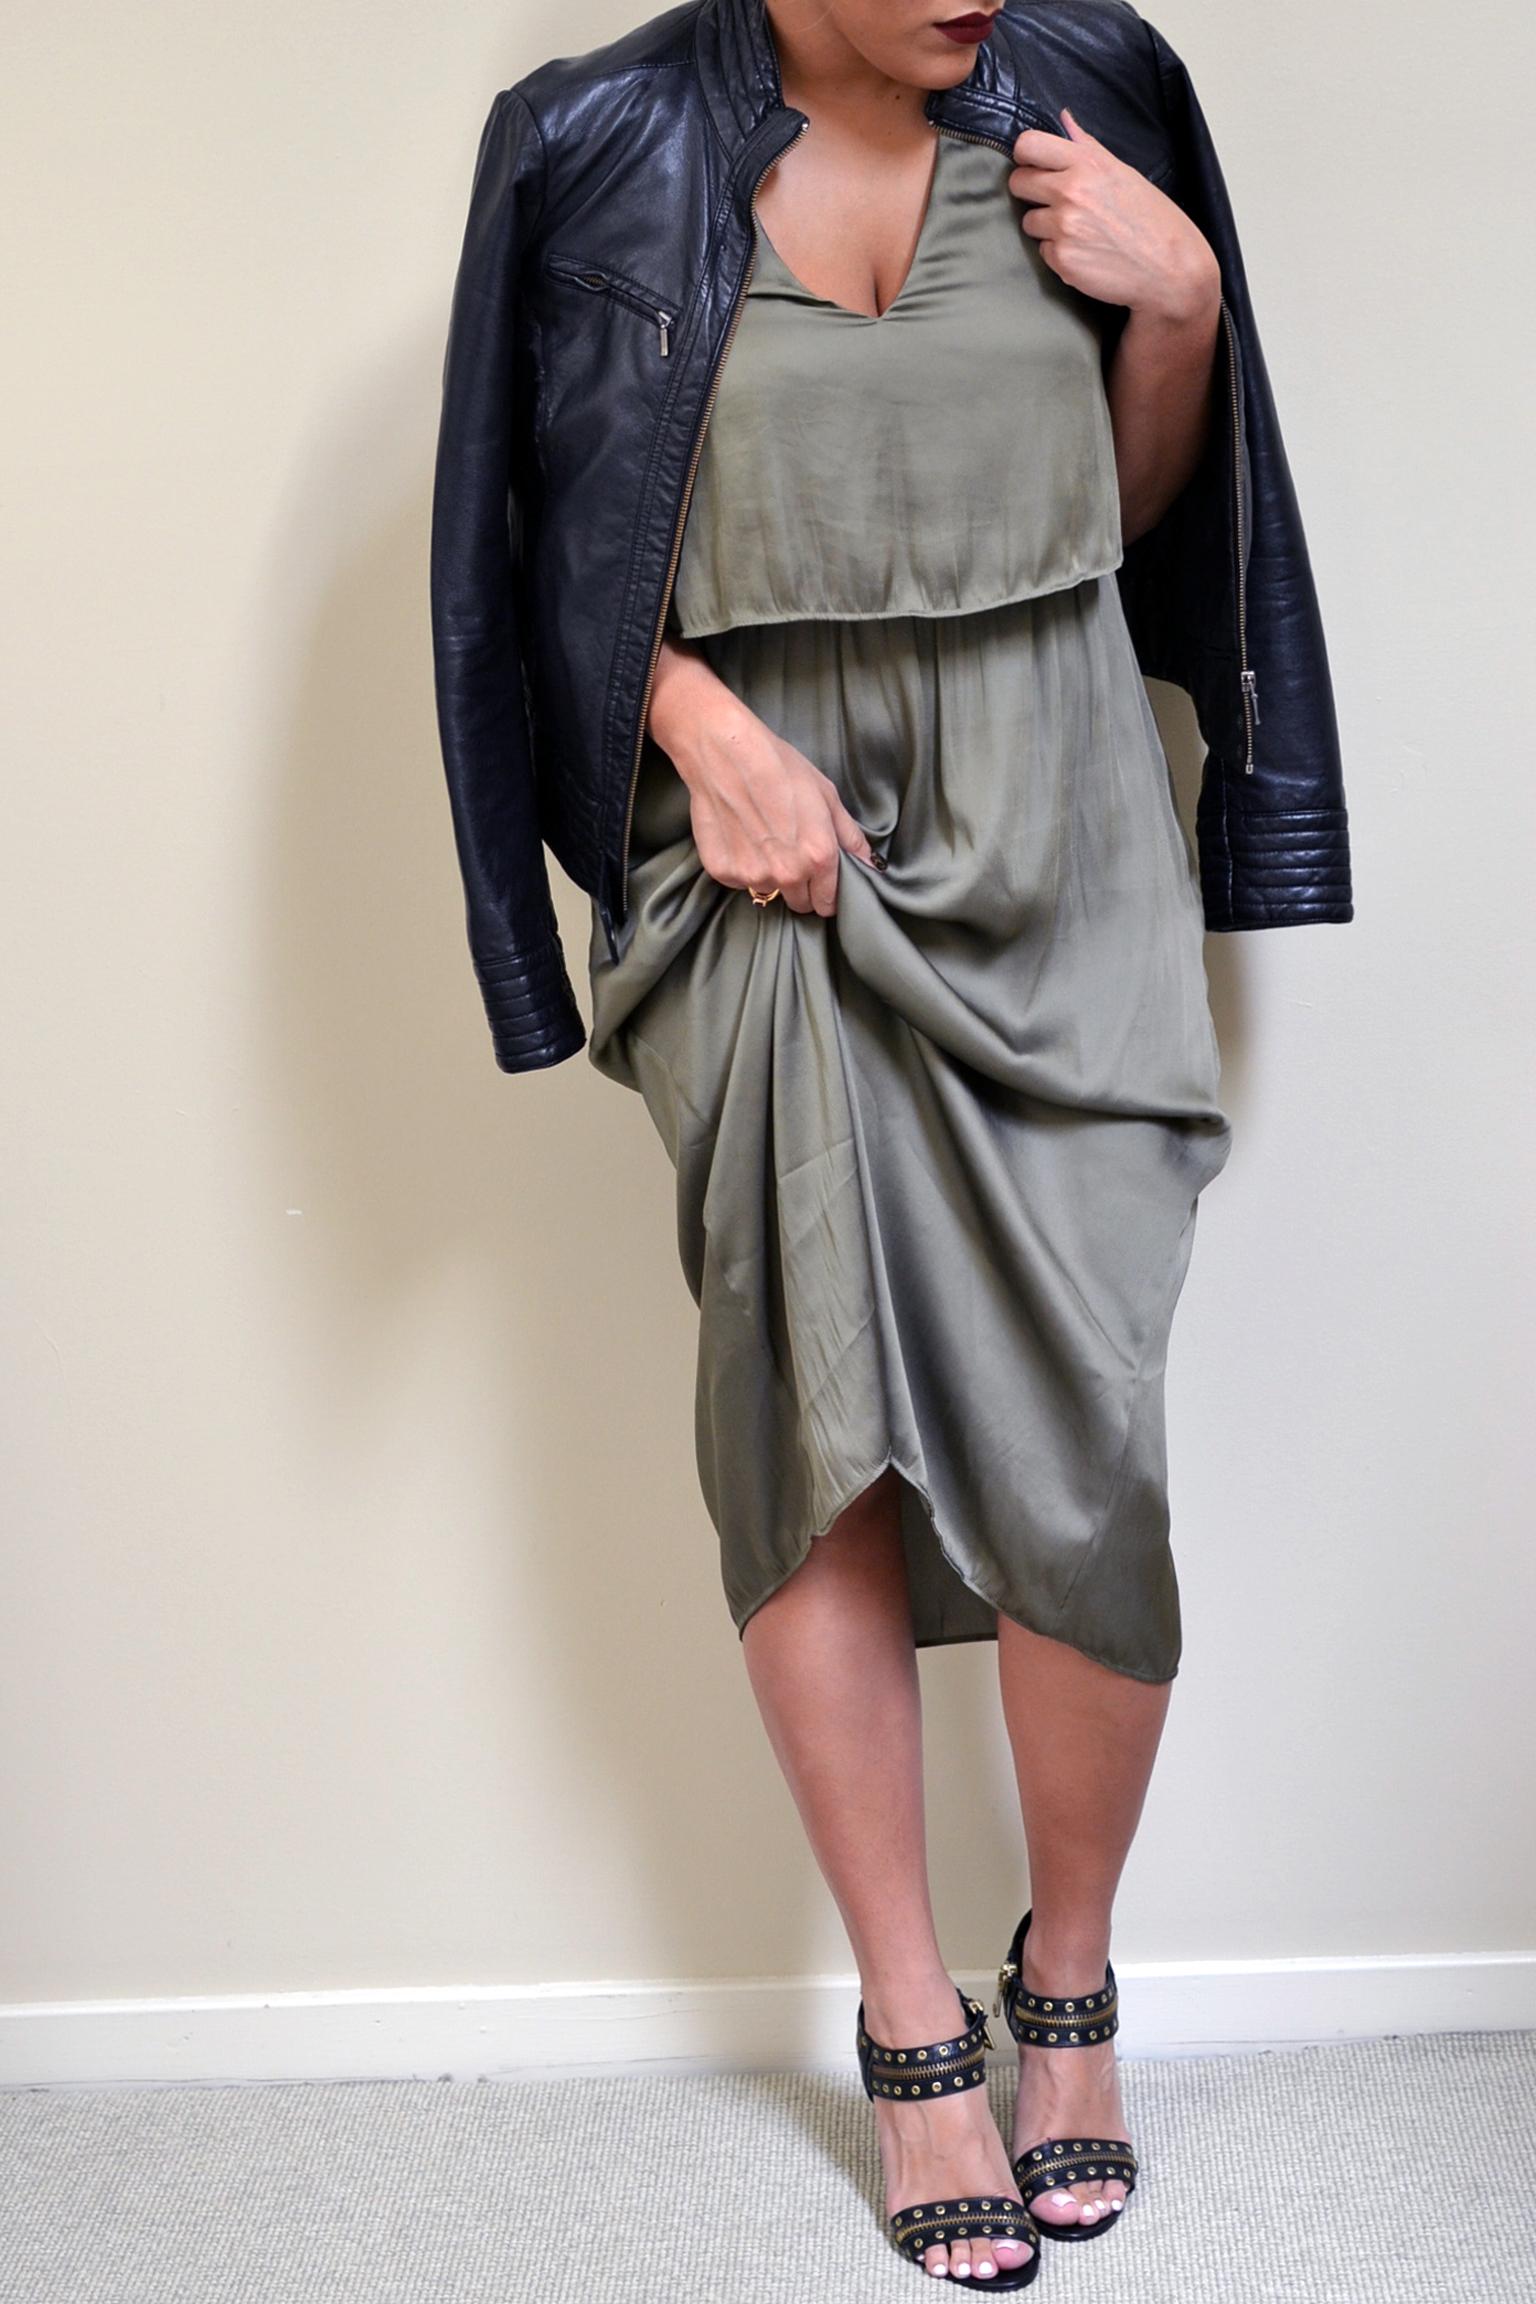 how-to-summer-to-fall-wardrobe-zara-zipper-sandals-leather-jacket.jpg